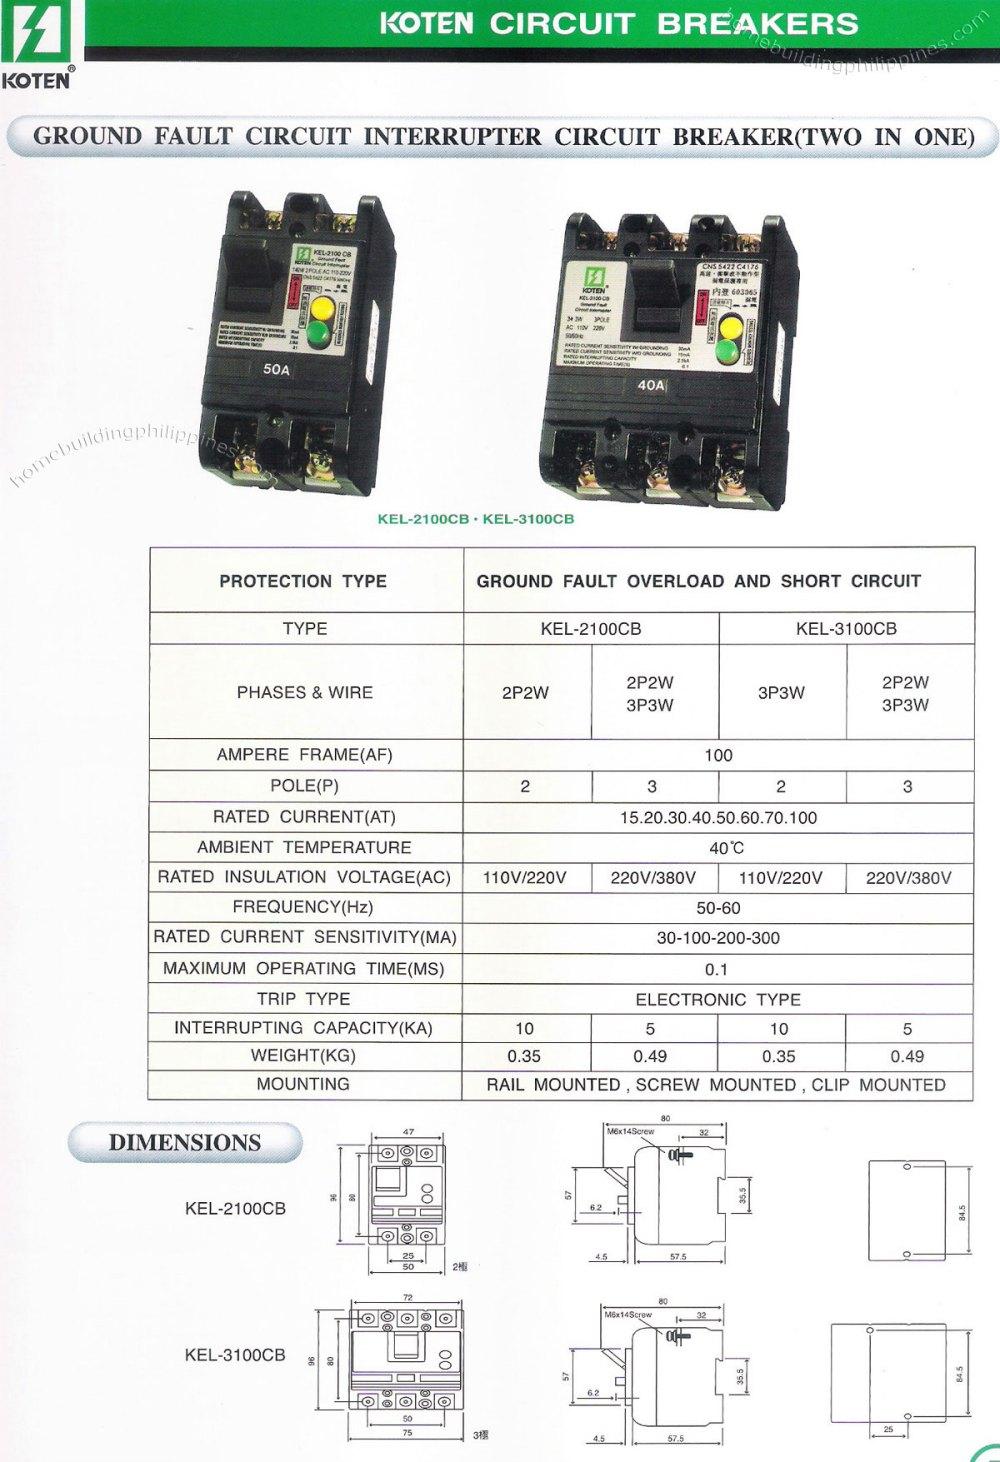 medium resolution of koten ground fault circuit interrupter circuit breaker koten ground fault circuit interrupter circuit breaker